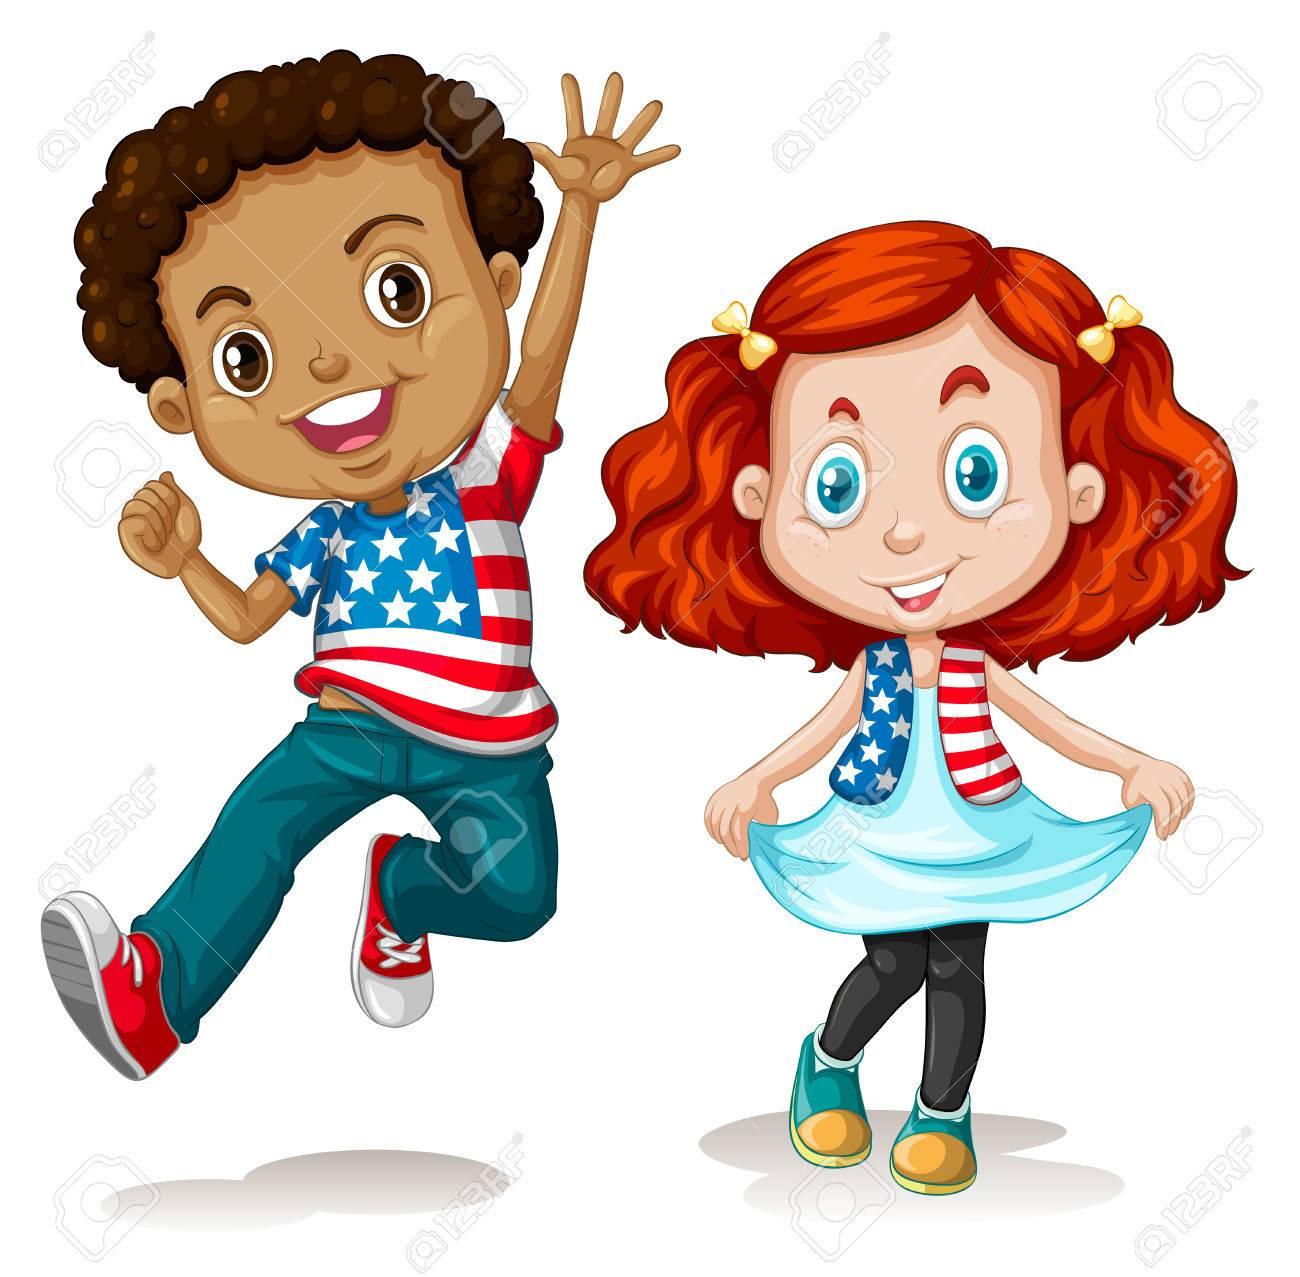 American boy and girl greeting illustration.